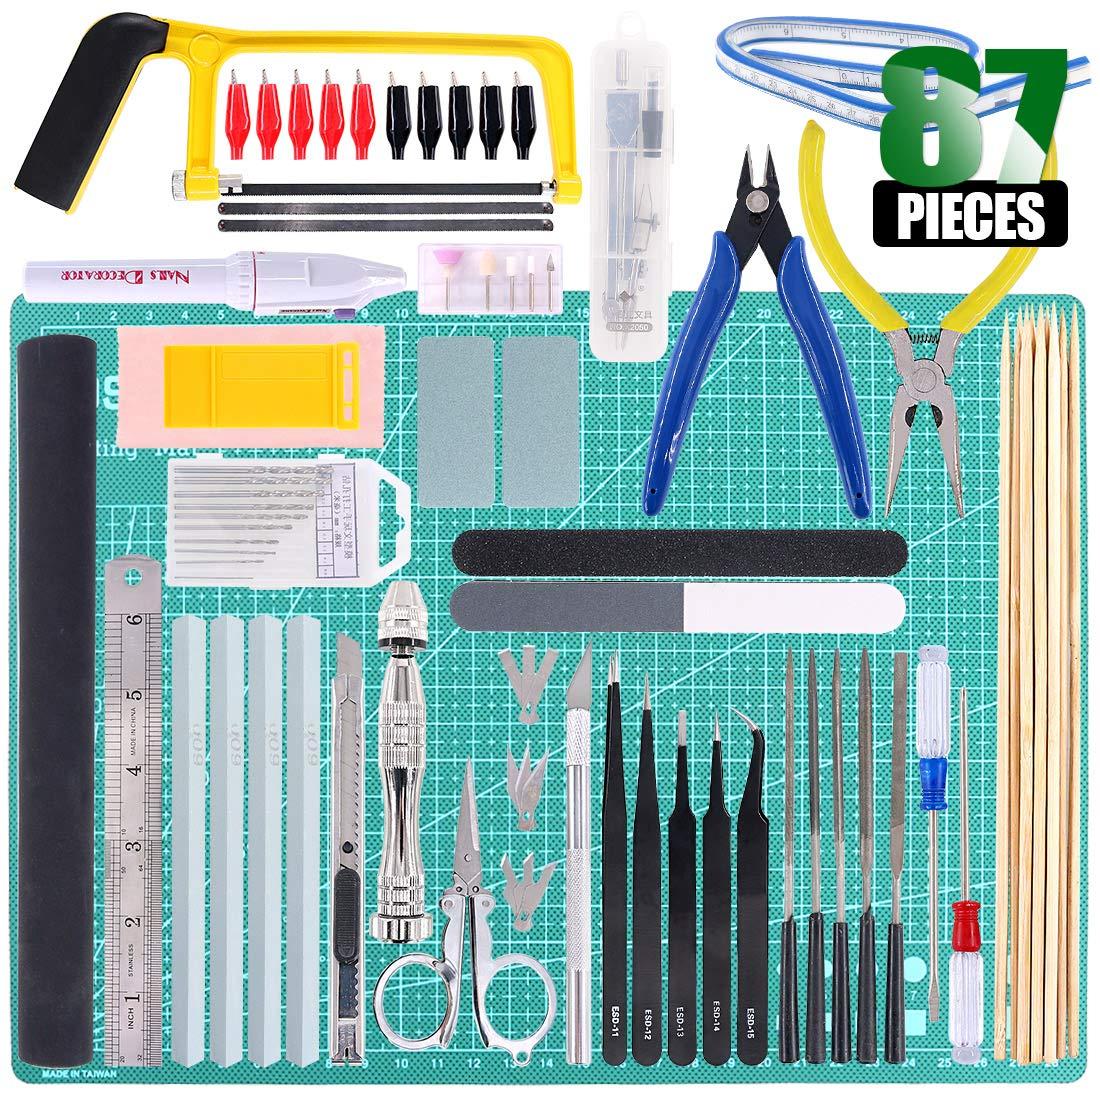 Keadic 87Pcs Modeler Basic Tools Craft Set Gundam Model Tools Kit with Plastic Box and Waterproof Bag for Gundam Car Model Building (Kit 10) by Keadic (Image #7)